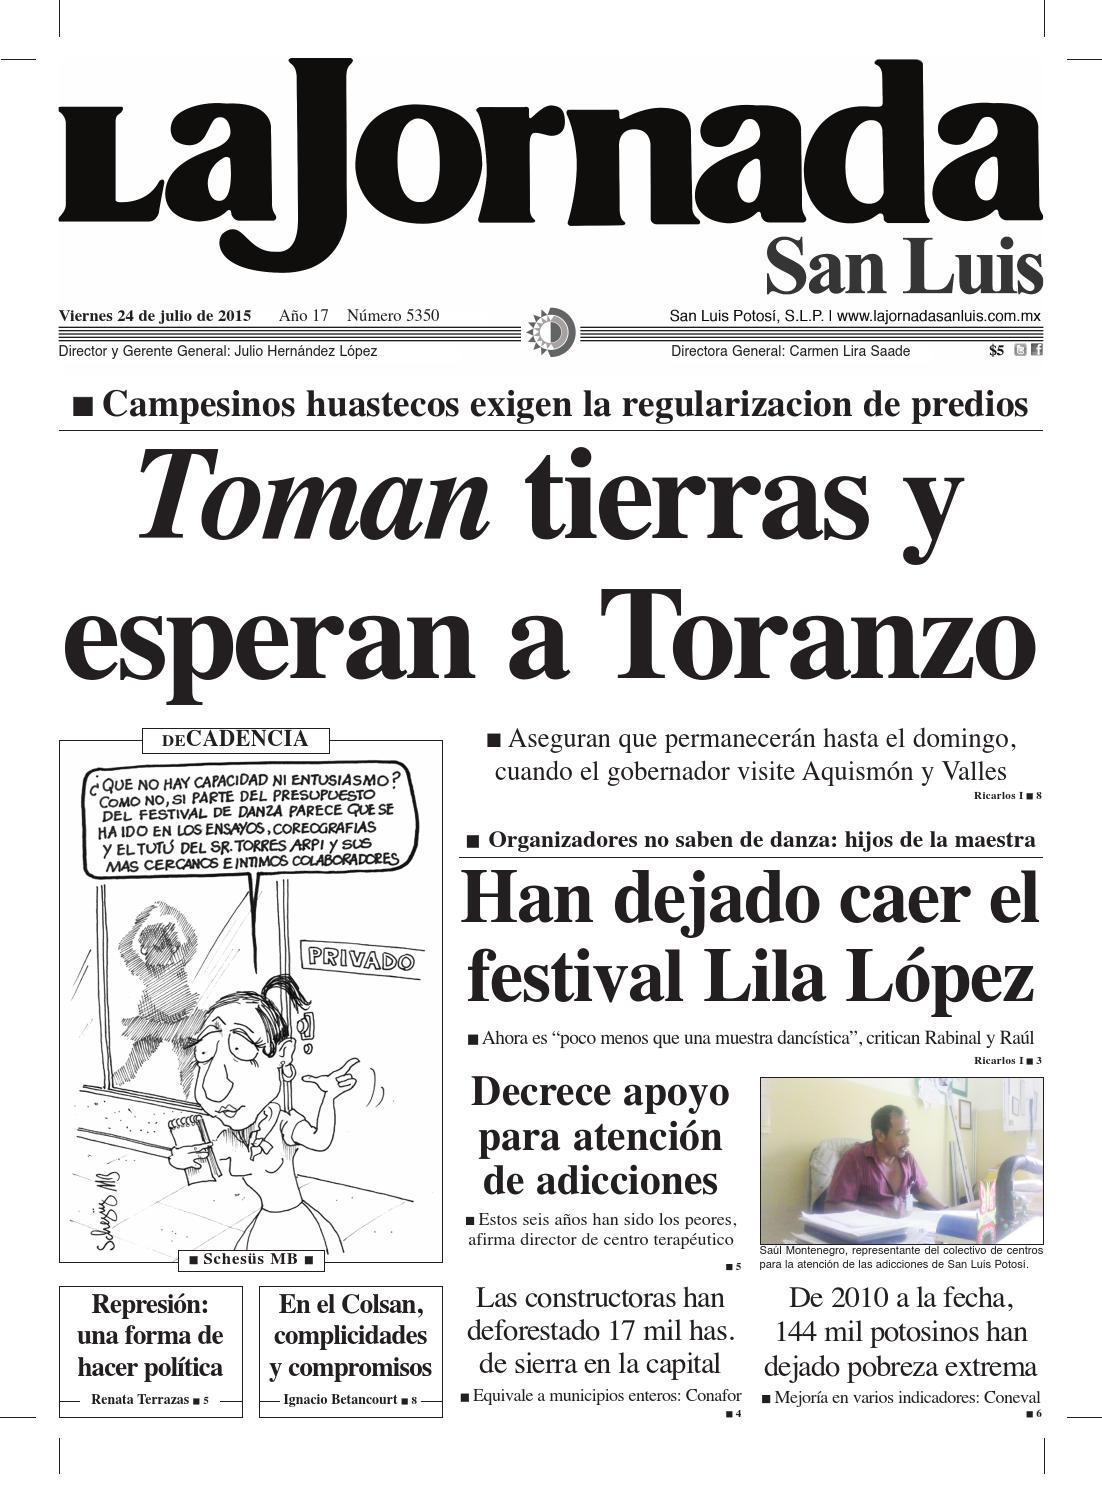 Toman tierras y esperan a Toranzo by La Jornada San Luis - issuu